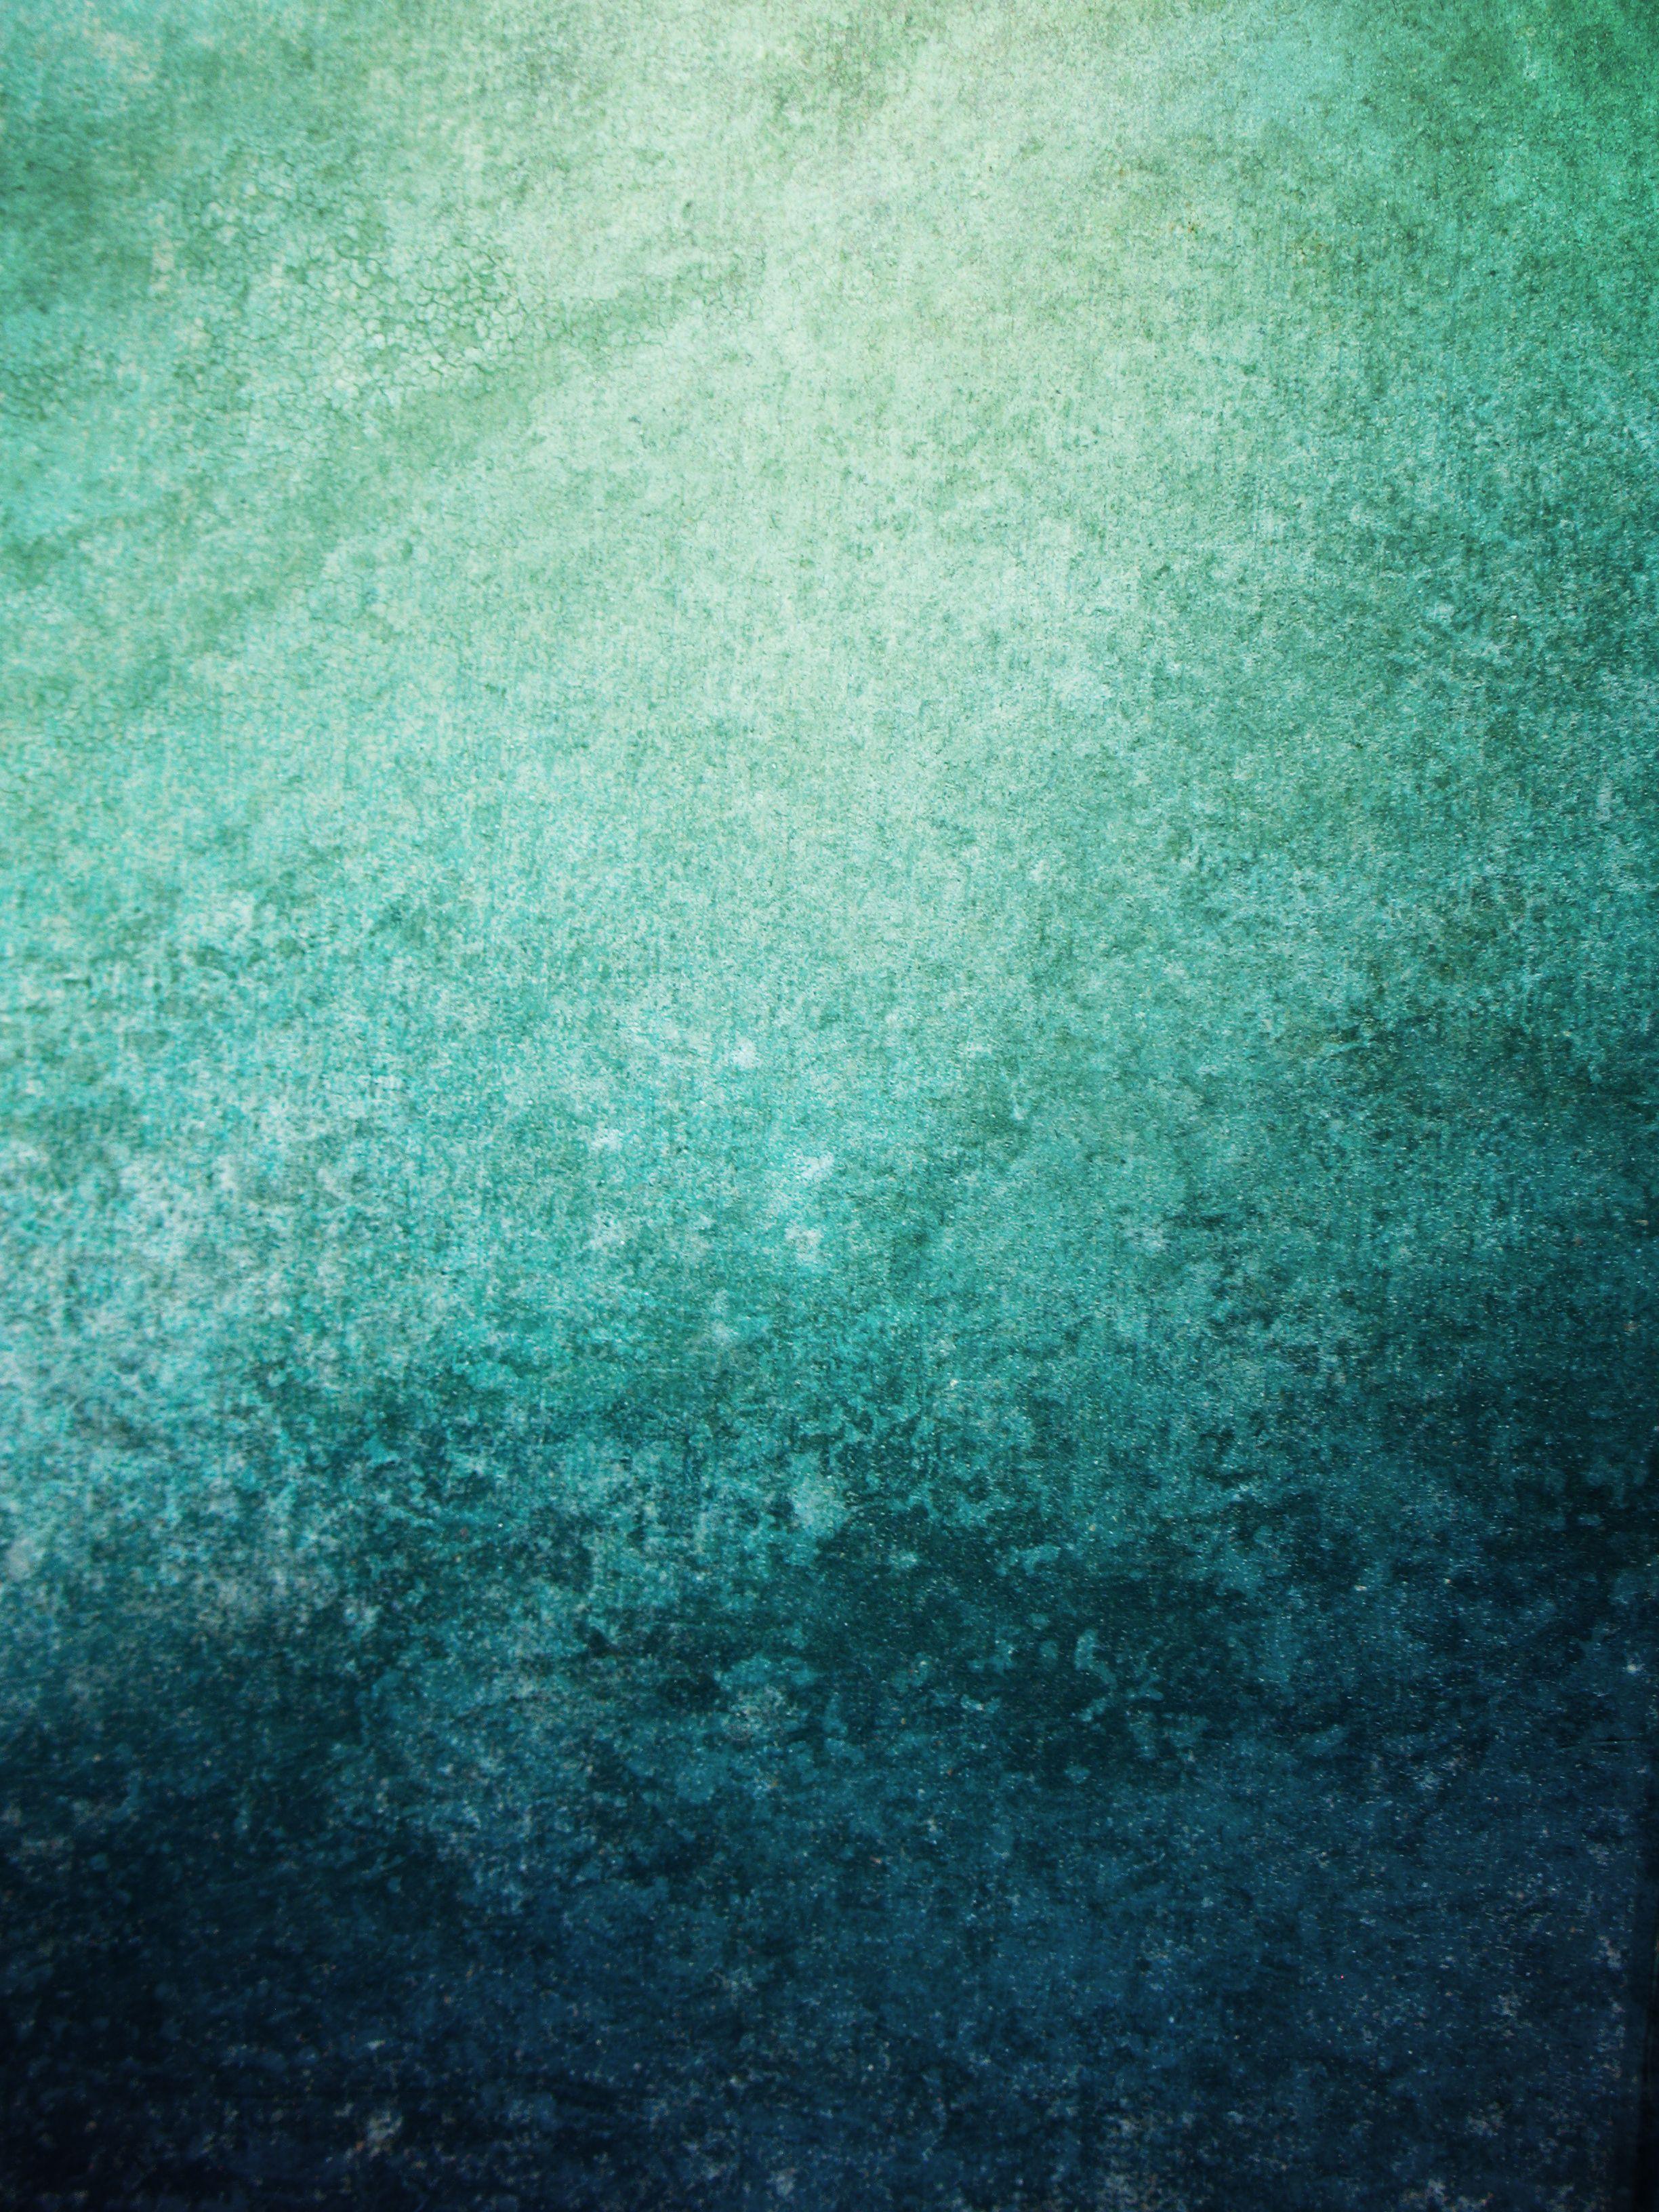 Home Textured background, Texture art, Texture